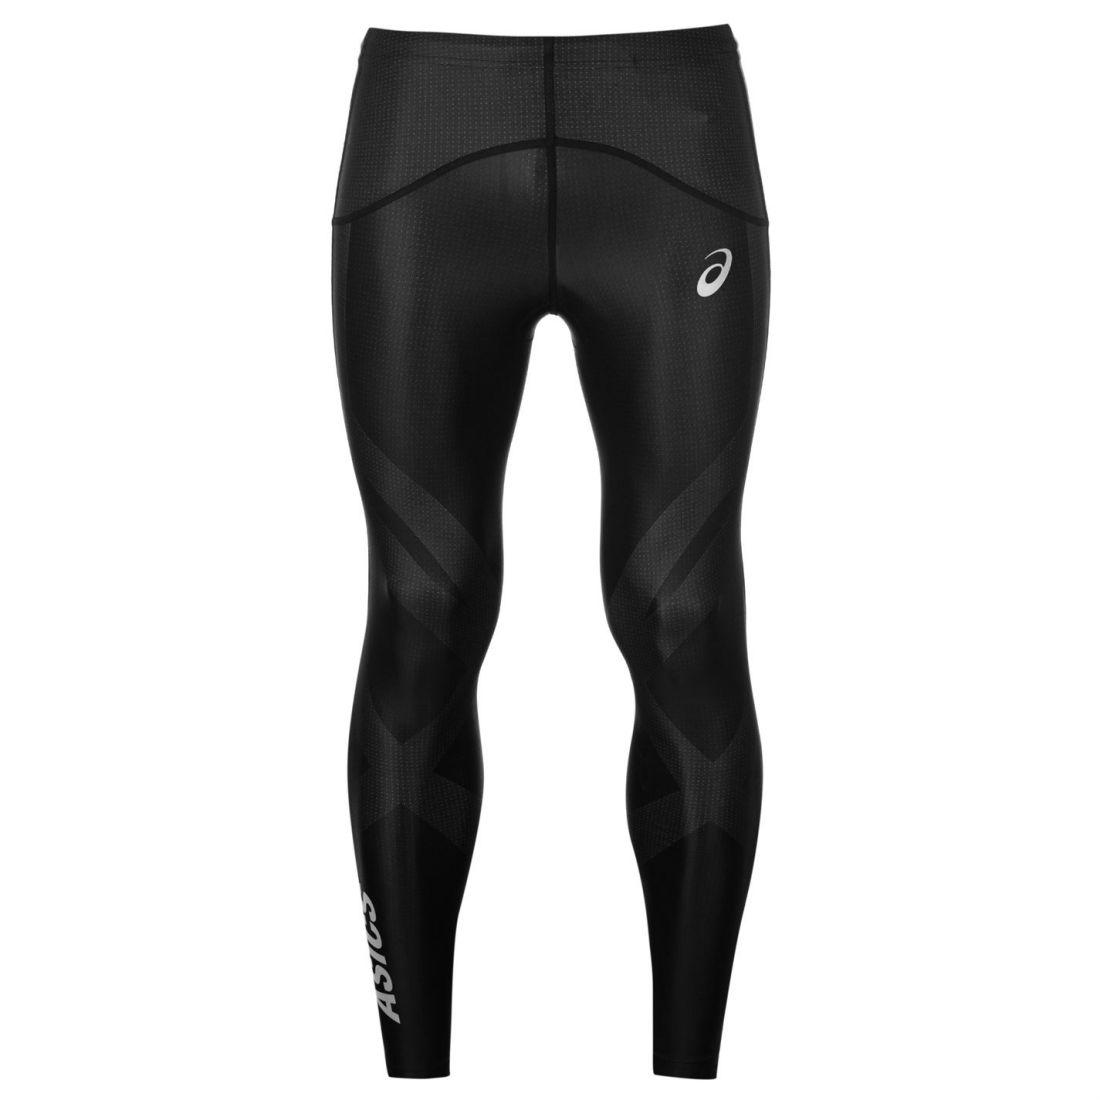 Asics para hombre acabado ventaja Calzas Pantalones Pantalones Pantalones  perfecta de rendimiento  calidad de primera clase